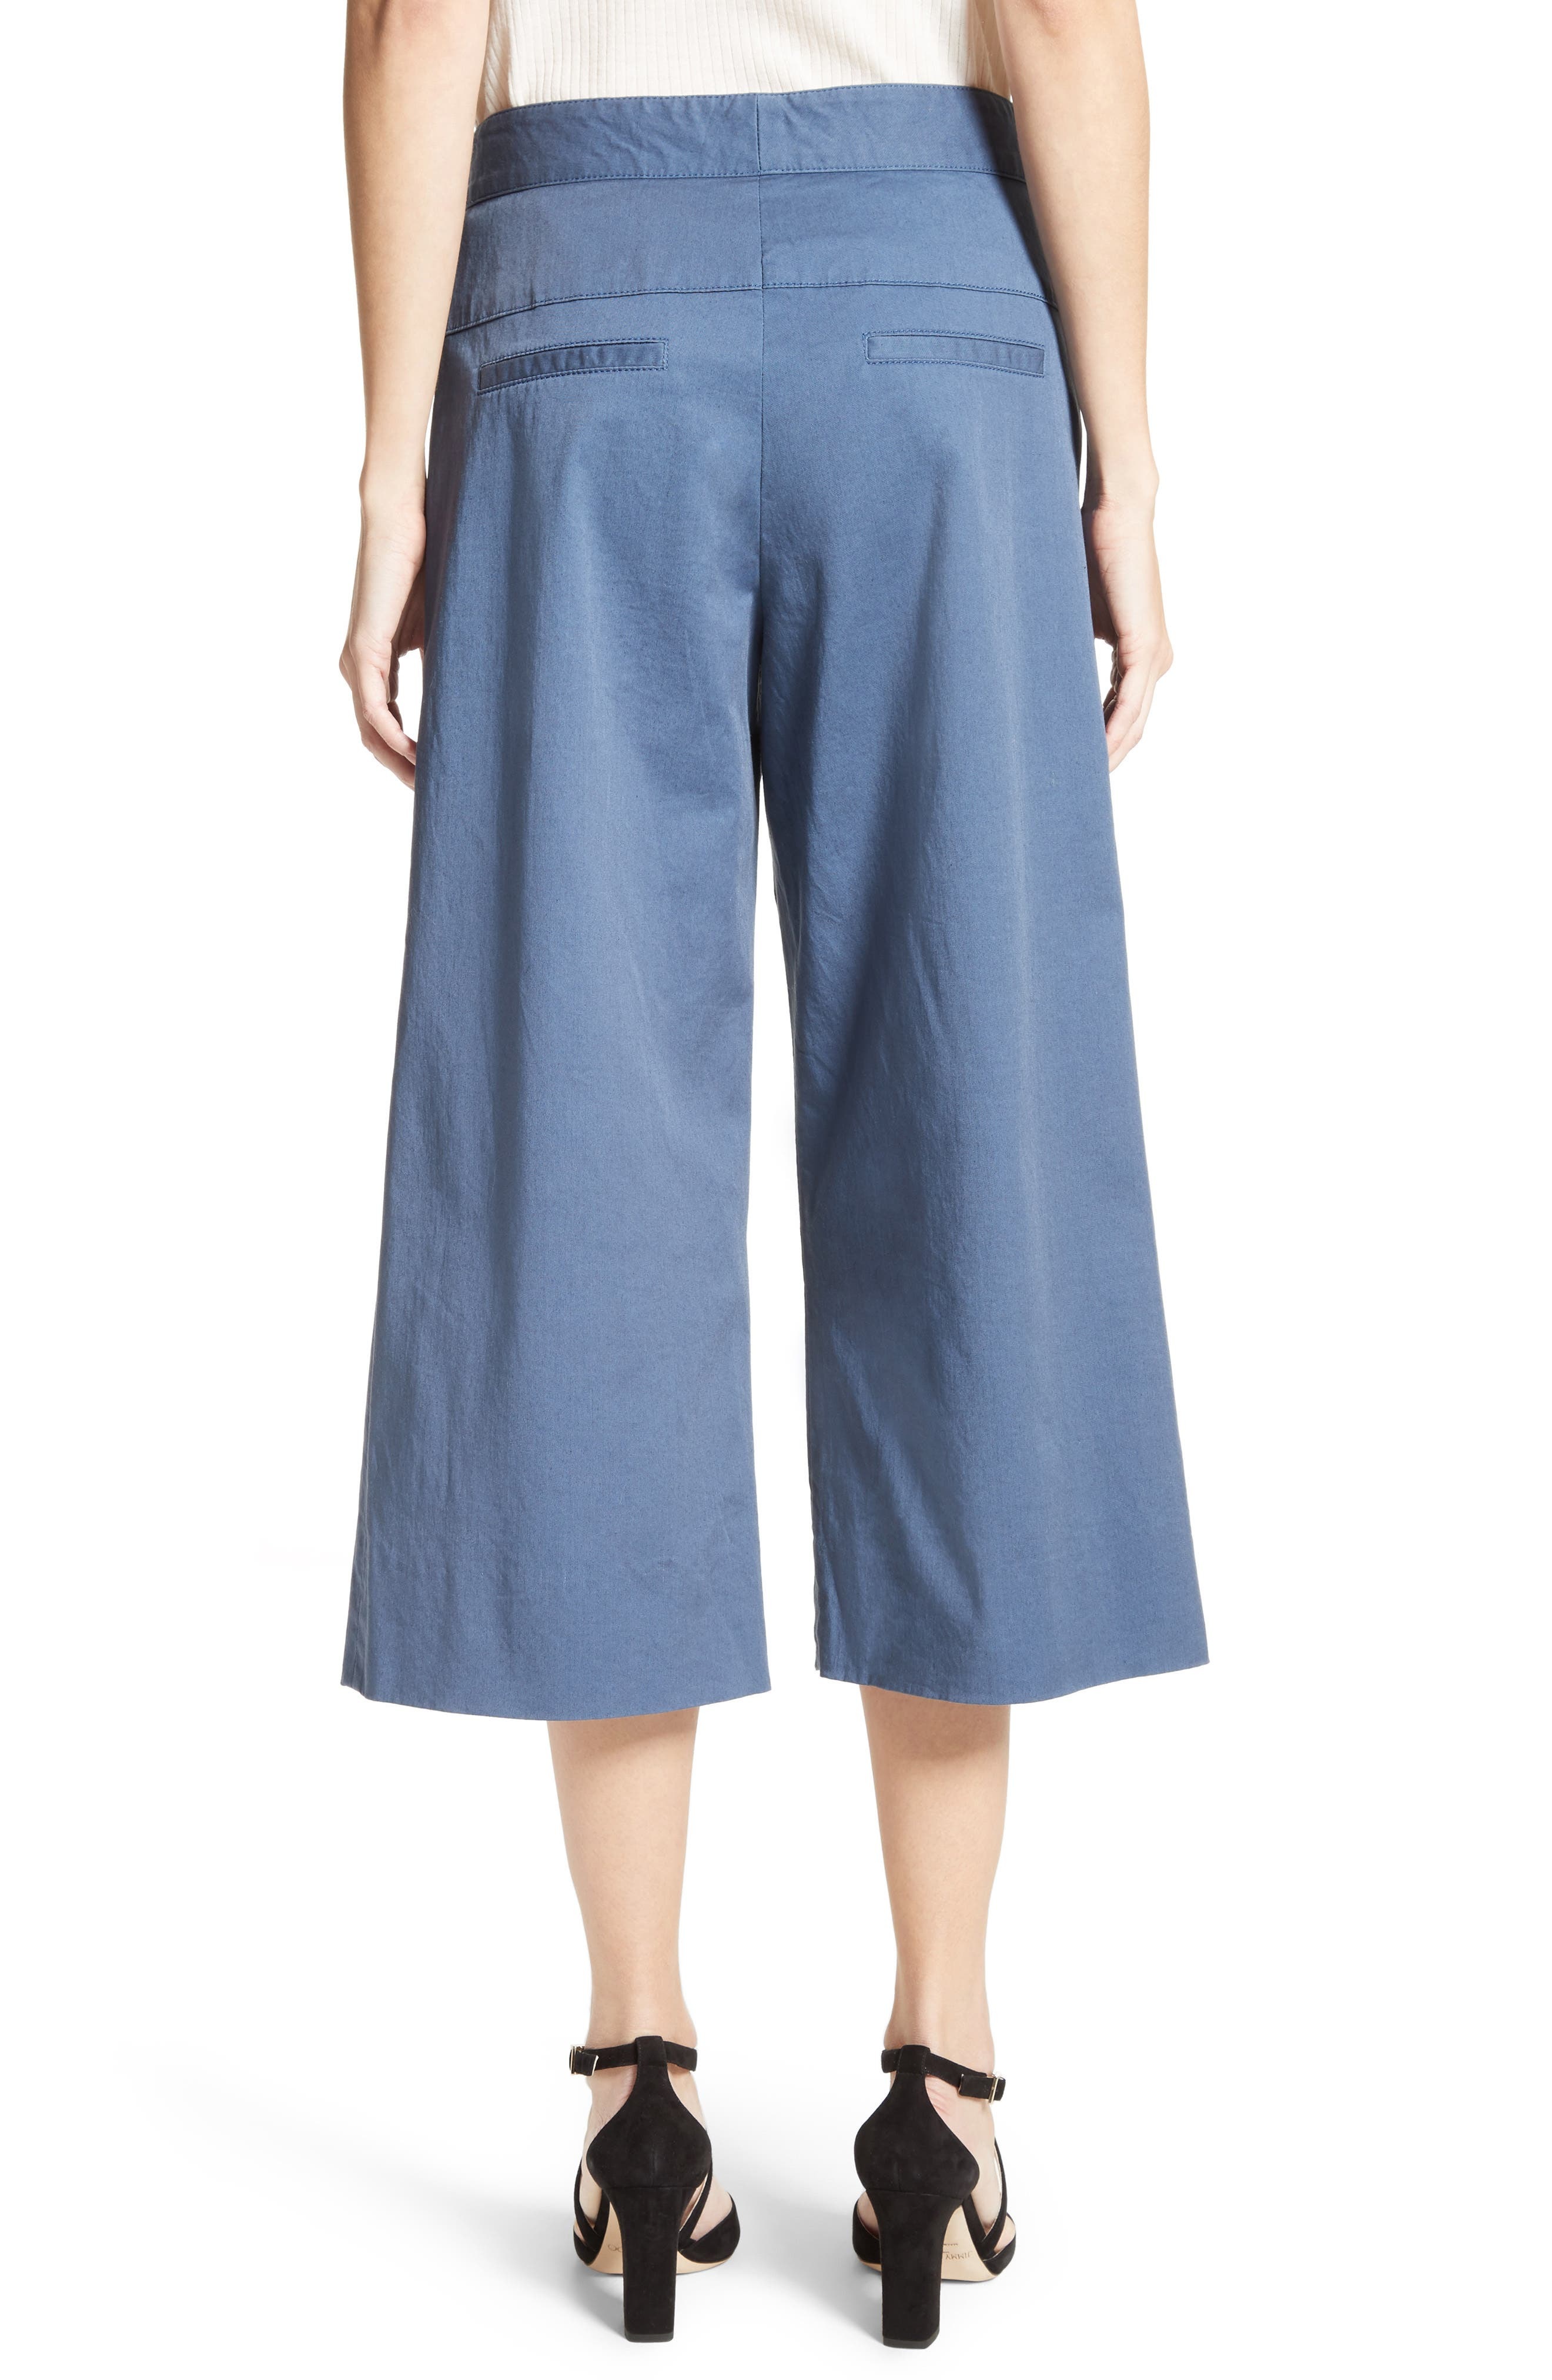 Cheyenne Wide Leg Crop Pants,                             Alternate thumbnail 2, color,                             438